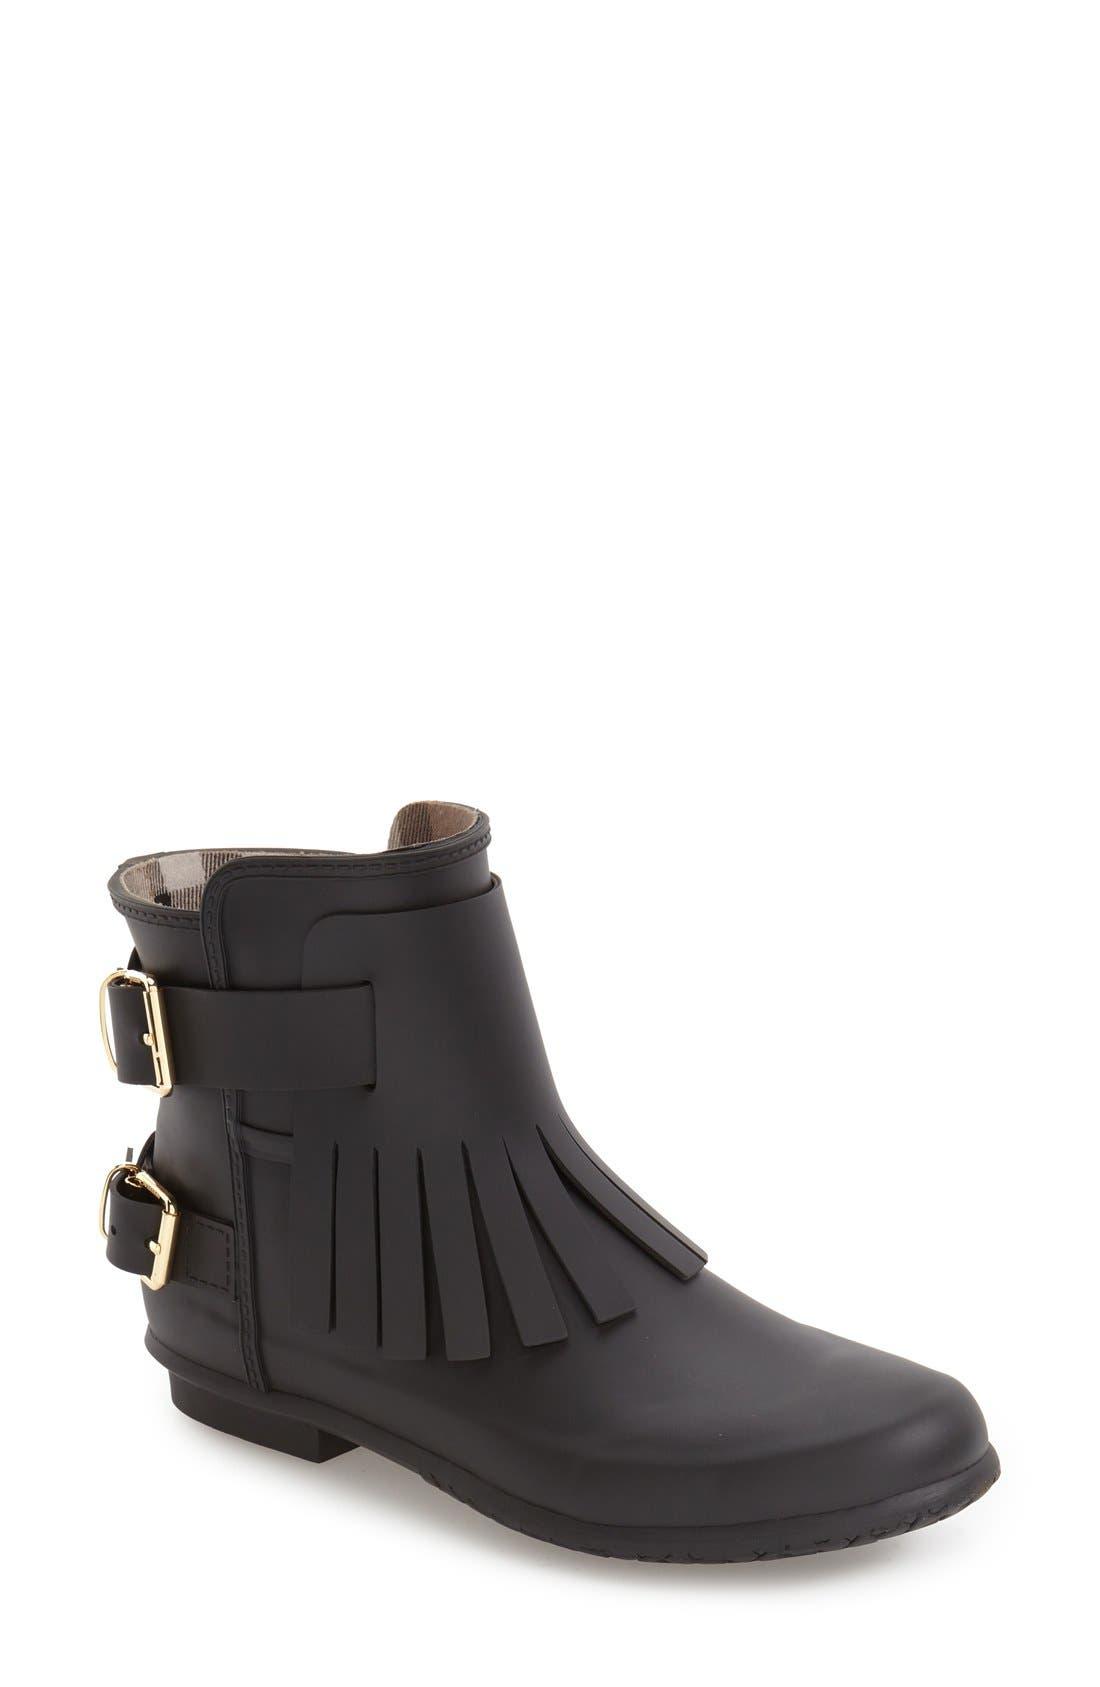 Alternate Image 1 Selected - Burberry 'Fritton' Kiltie Rain Boot (Women)